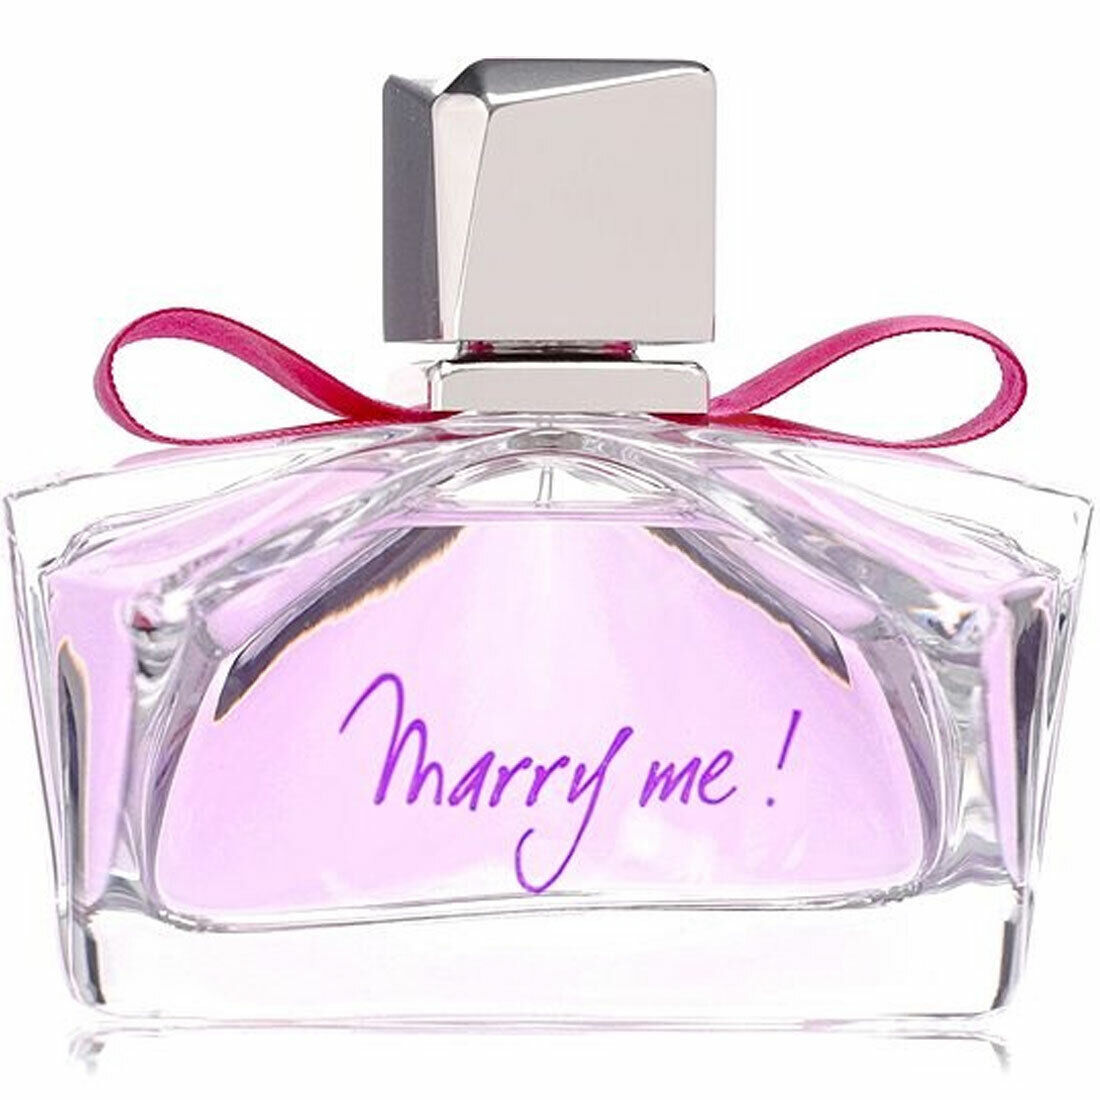 LANVIN MARRY ME EAU DE PARFUM Perfume Women 1.7 Oz NEW -33 Elixir Of Good Mood  - $34.99